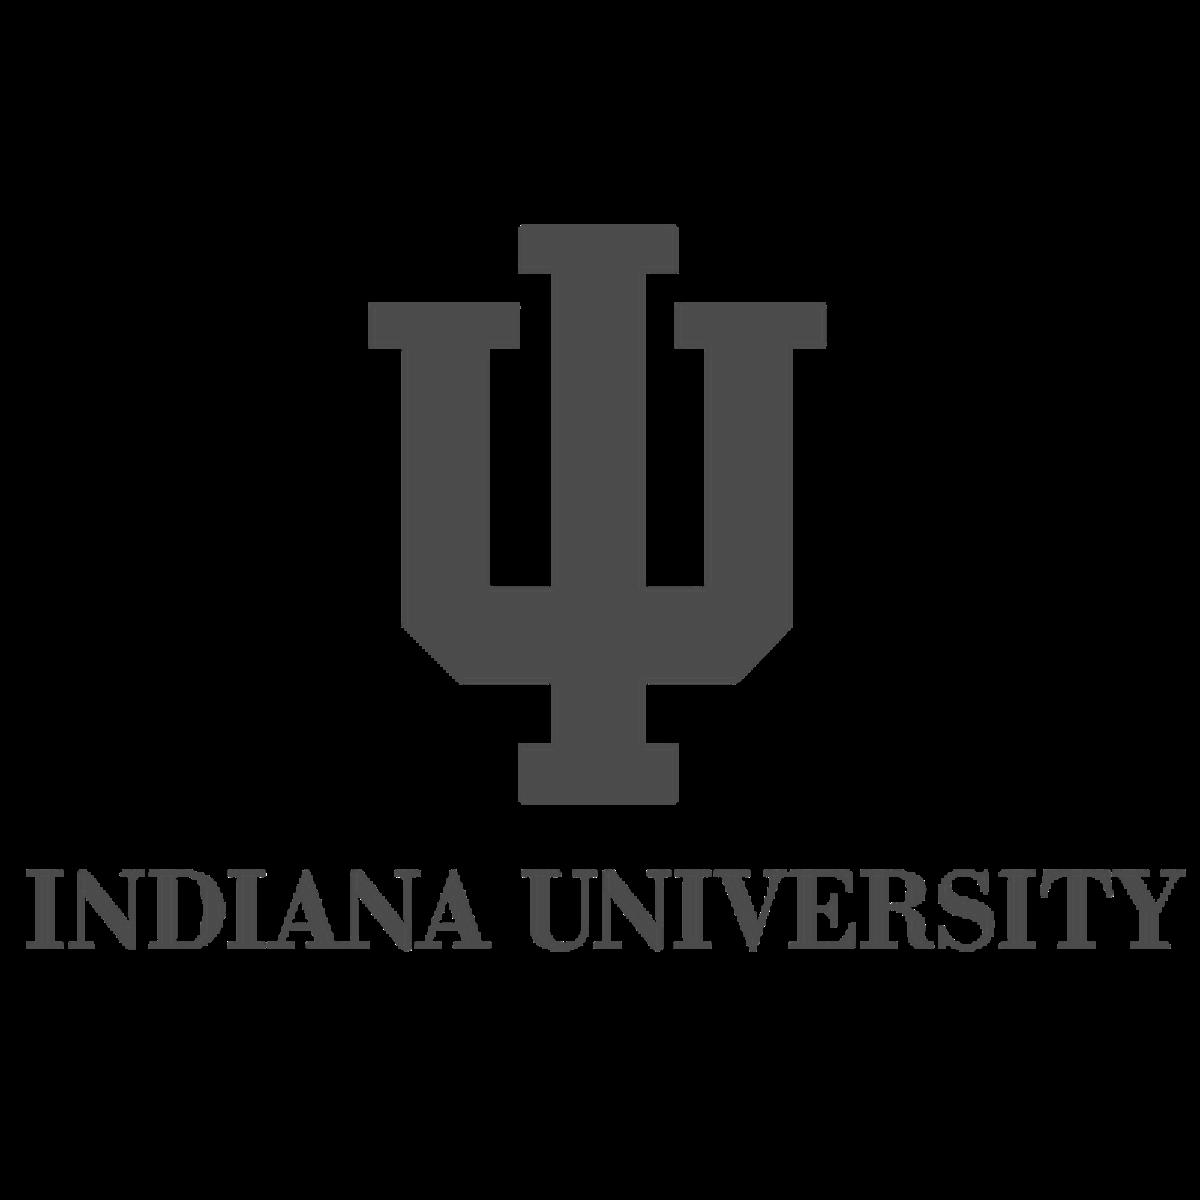 Indiana University Campus Protein